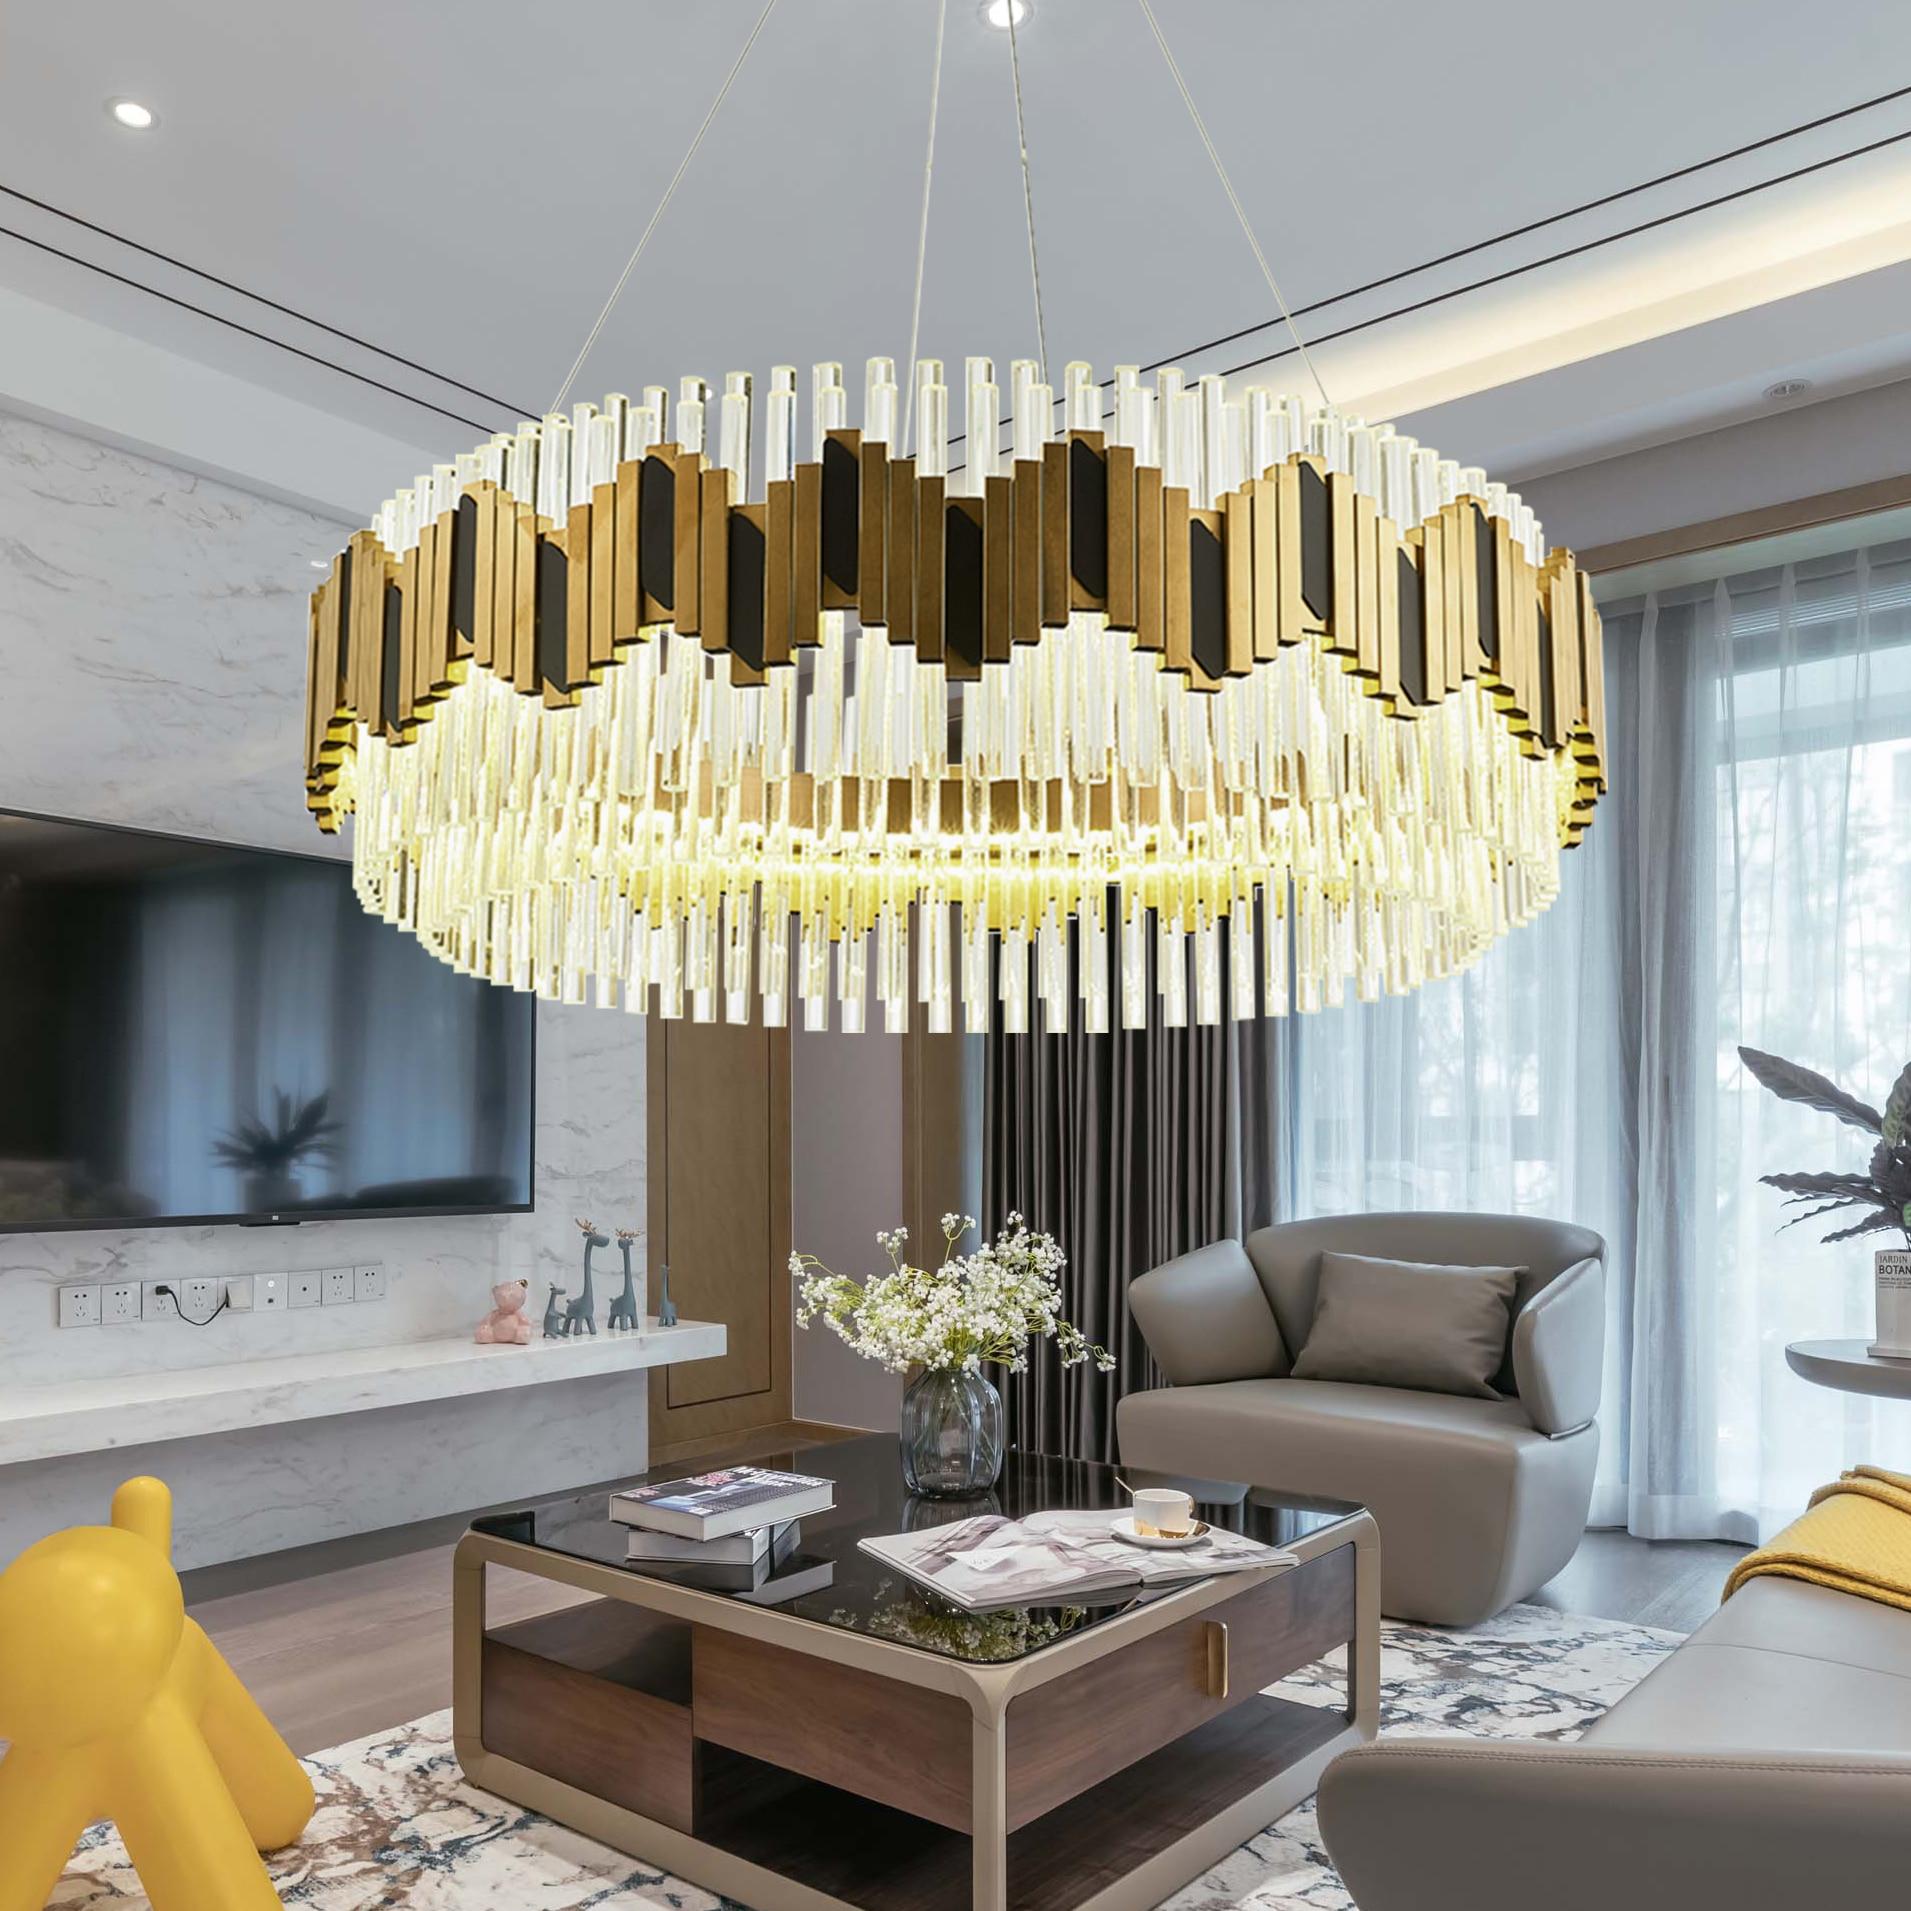 Candelabros de oro moderno, lámpara colgante de Cristal de lujo para sala de estar, lámpara colgante larga para vestíbulo, candelabro LED de Cristal